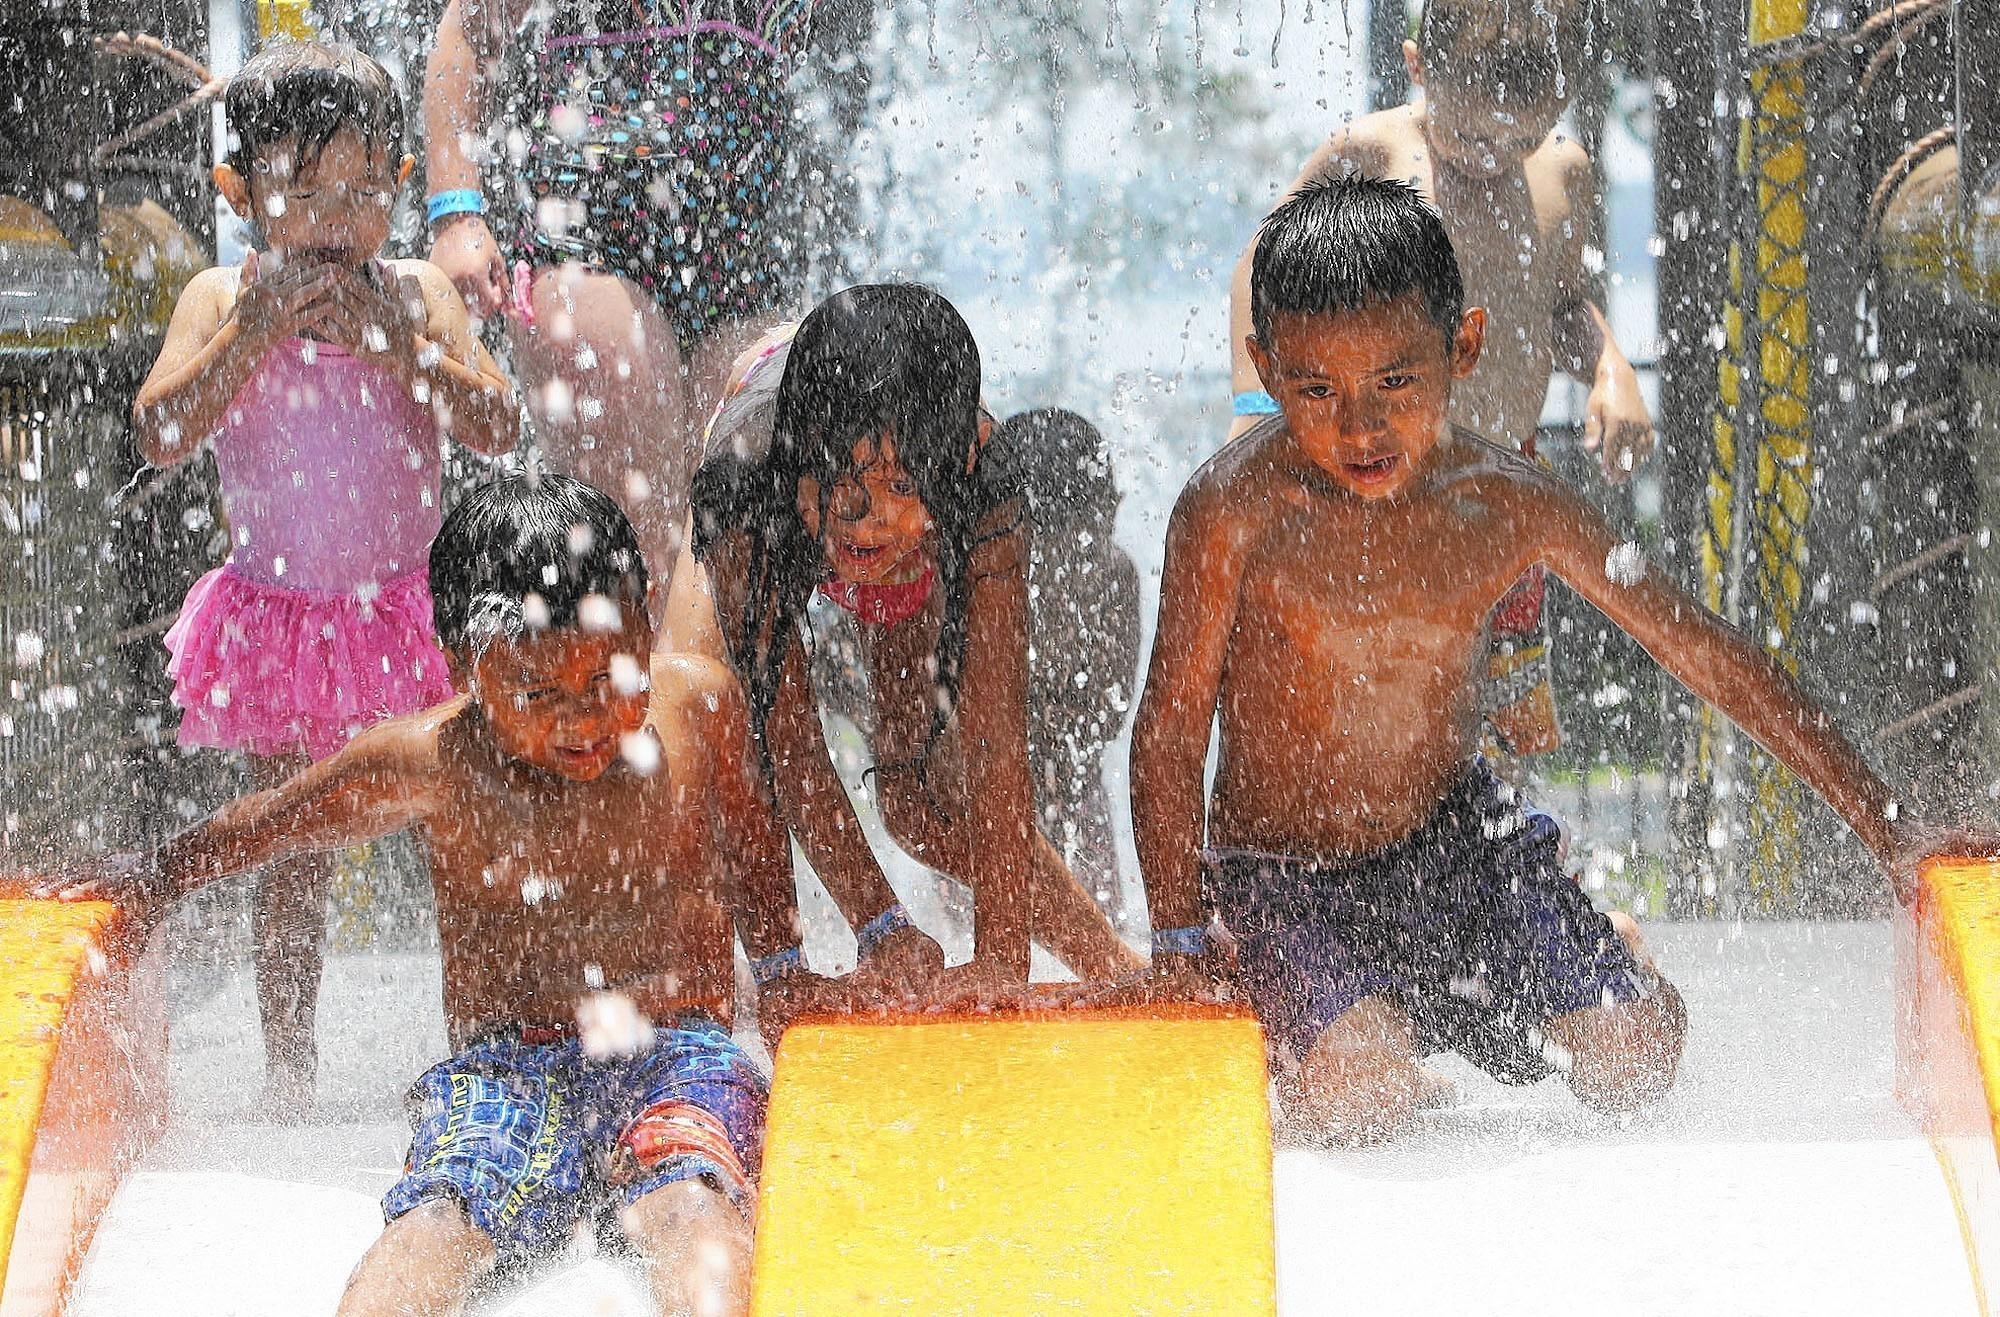 central florida cities dive into splash pads orlando sentinel